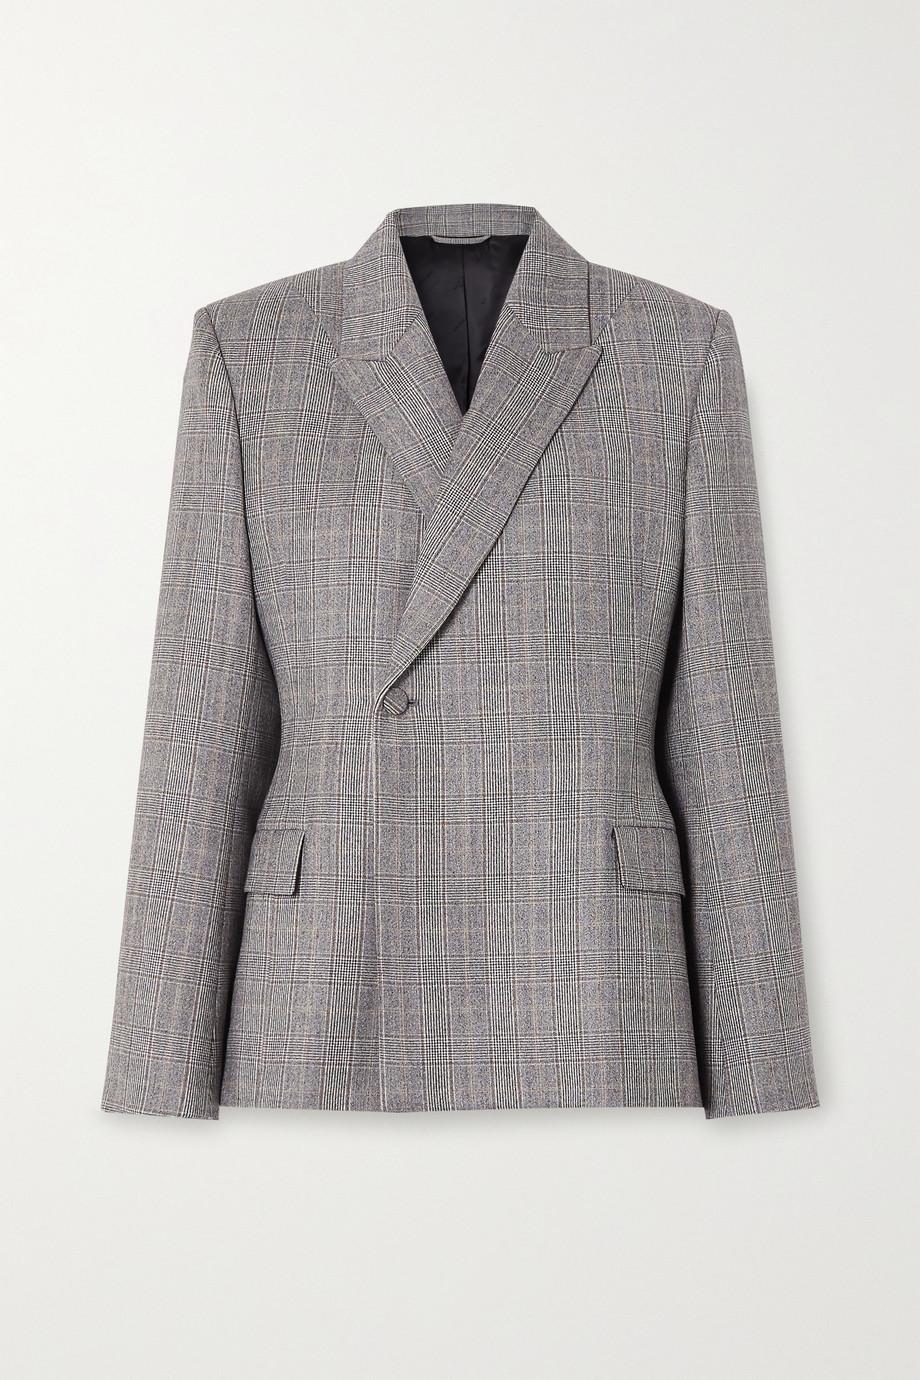 Balenciaga Prince of Wales checked wool blazer